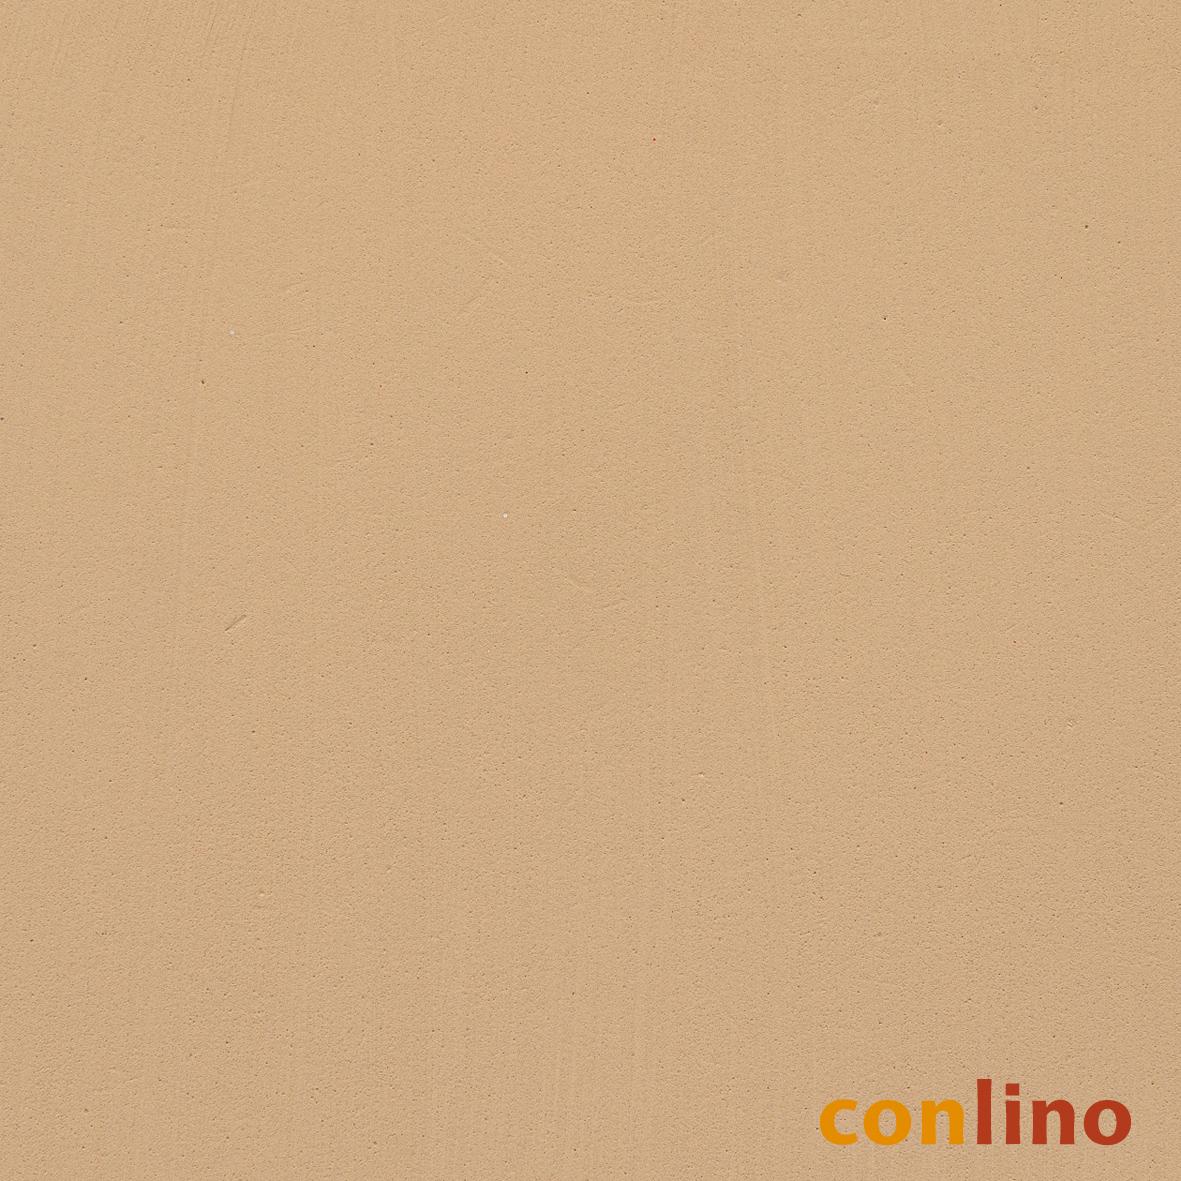 conluto Lehmfarbe Barro Tinaja CL 113